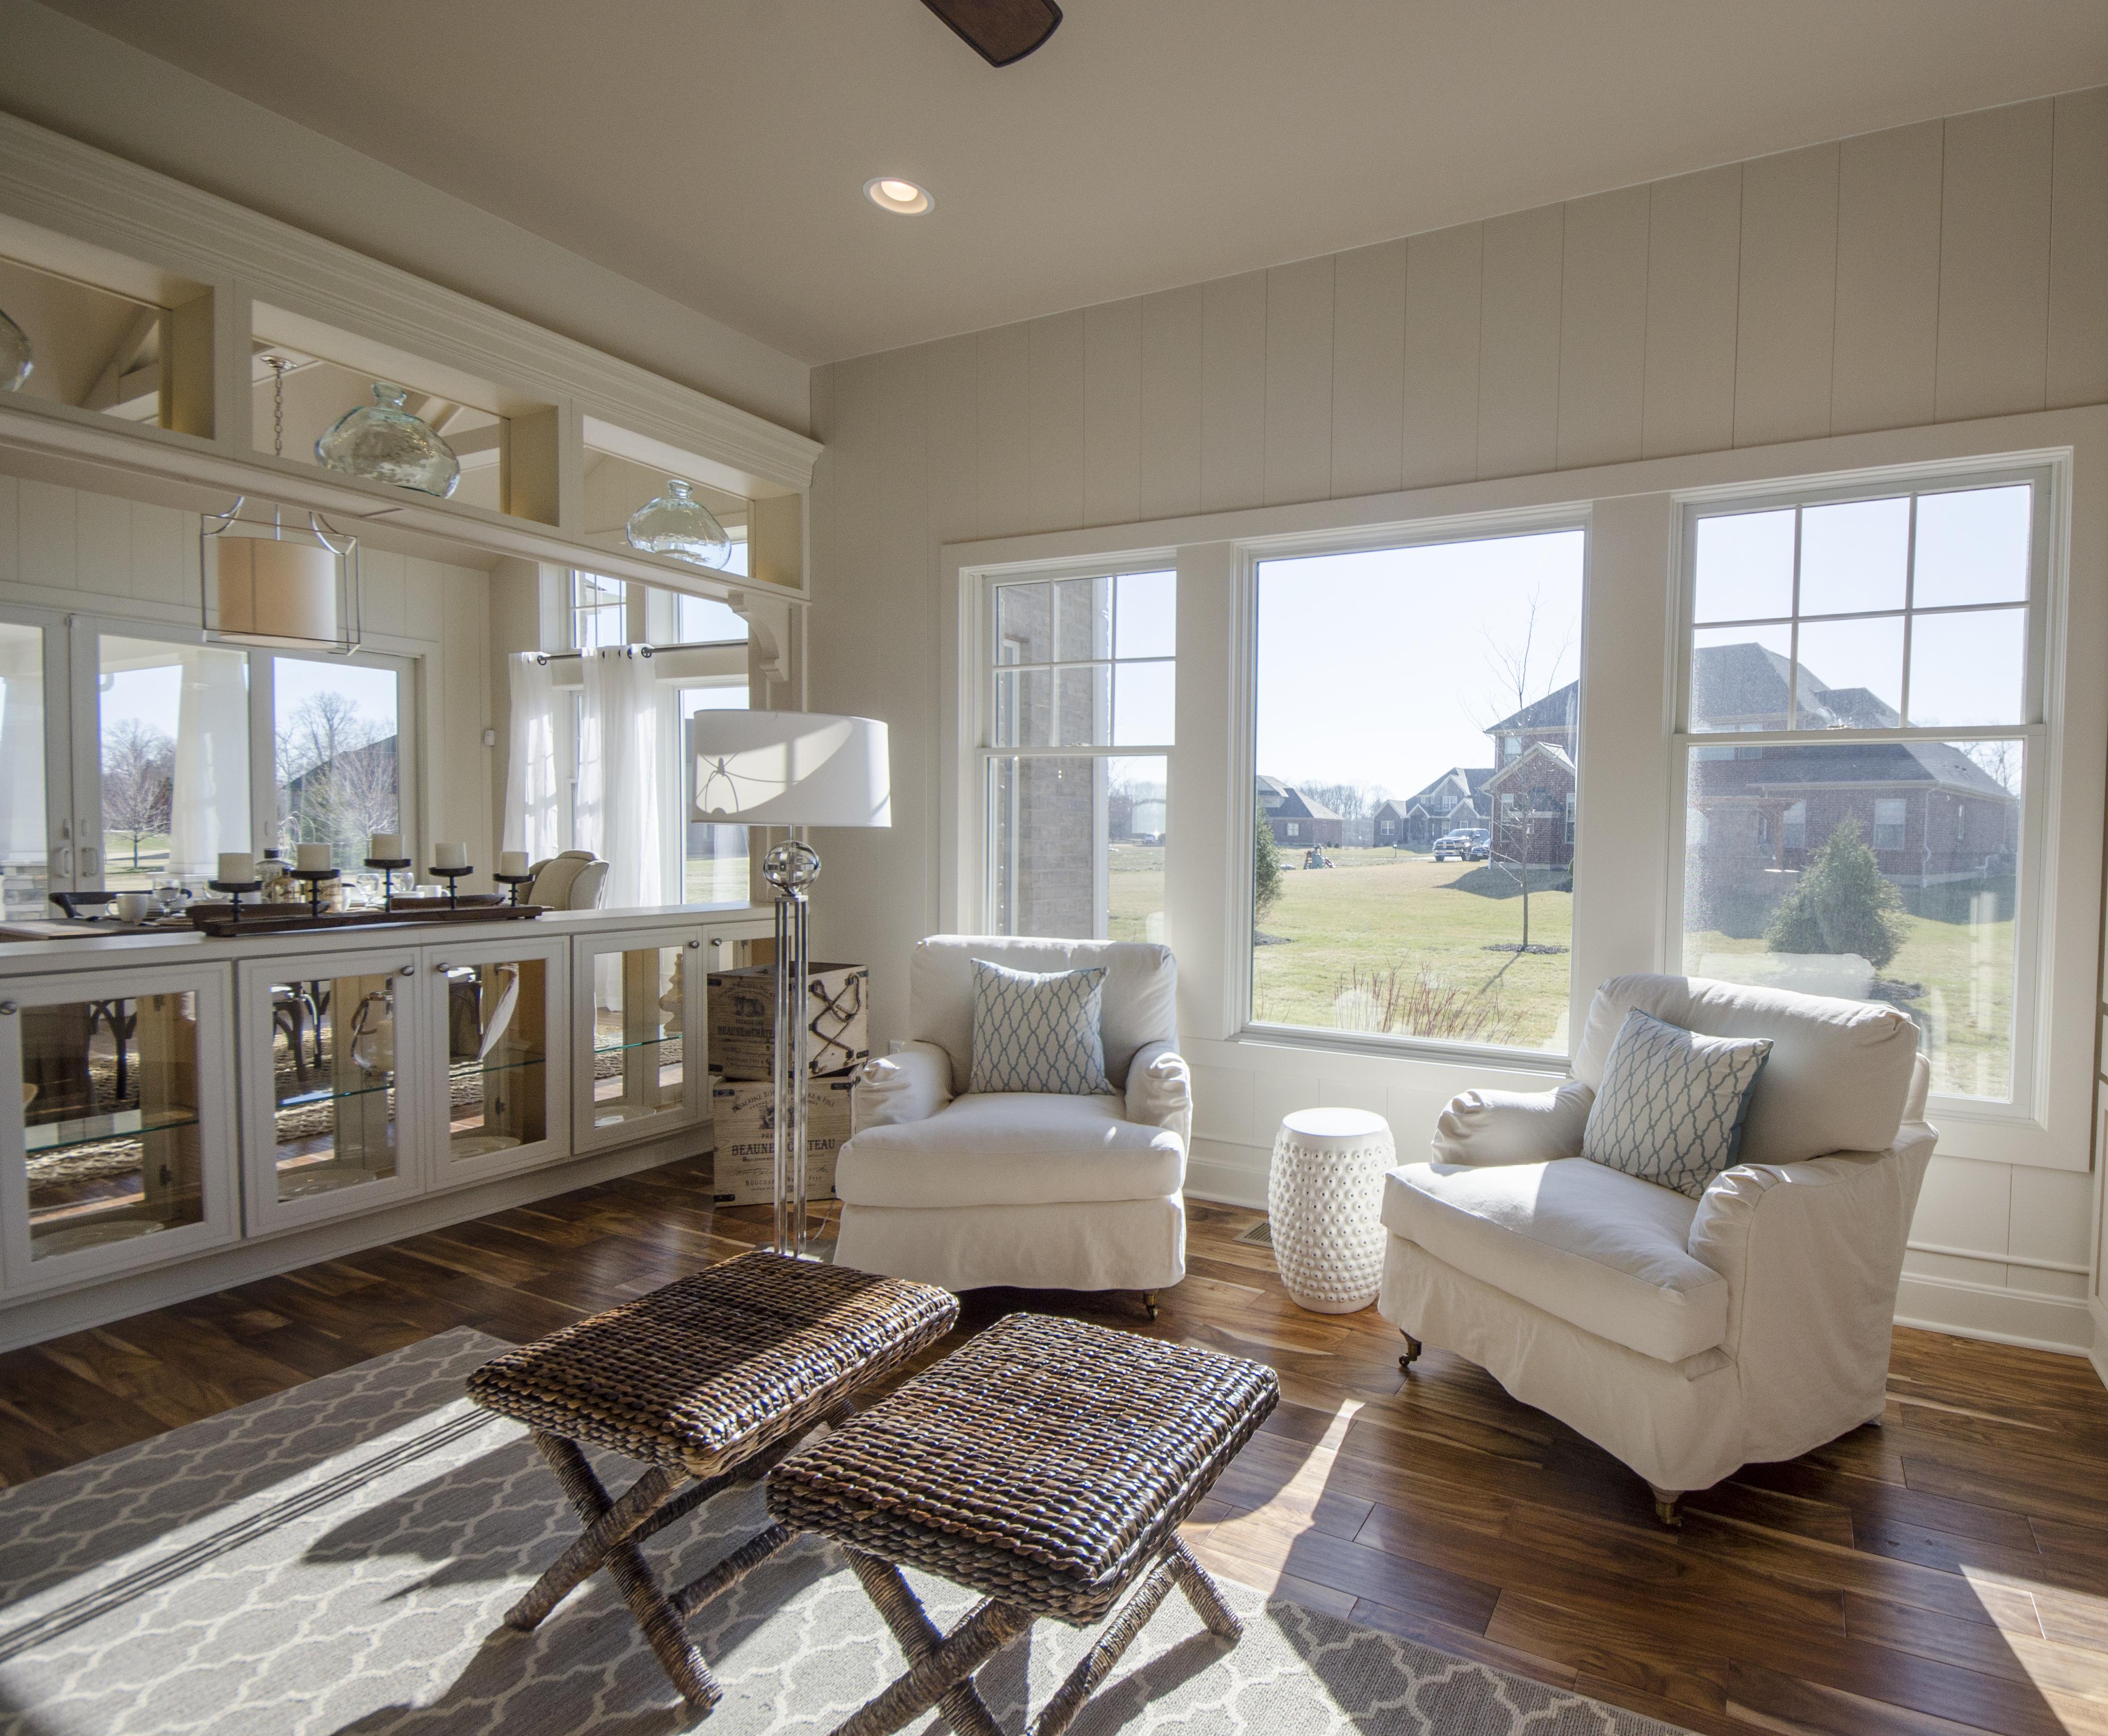 Decorating Room Ideas: Design Homes